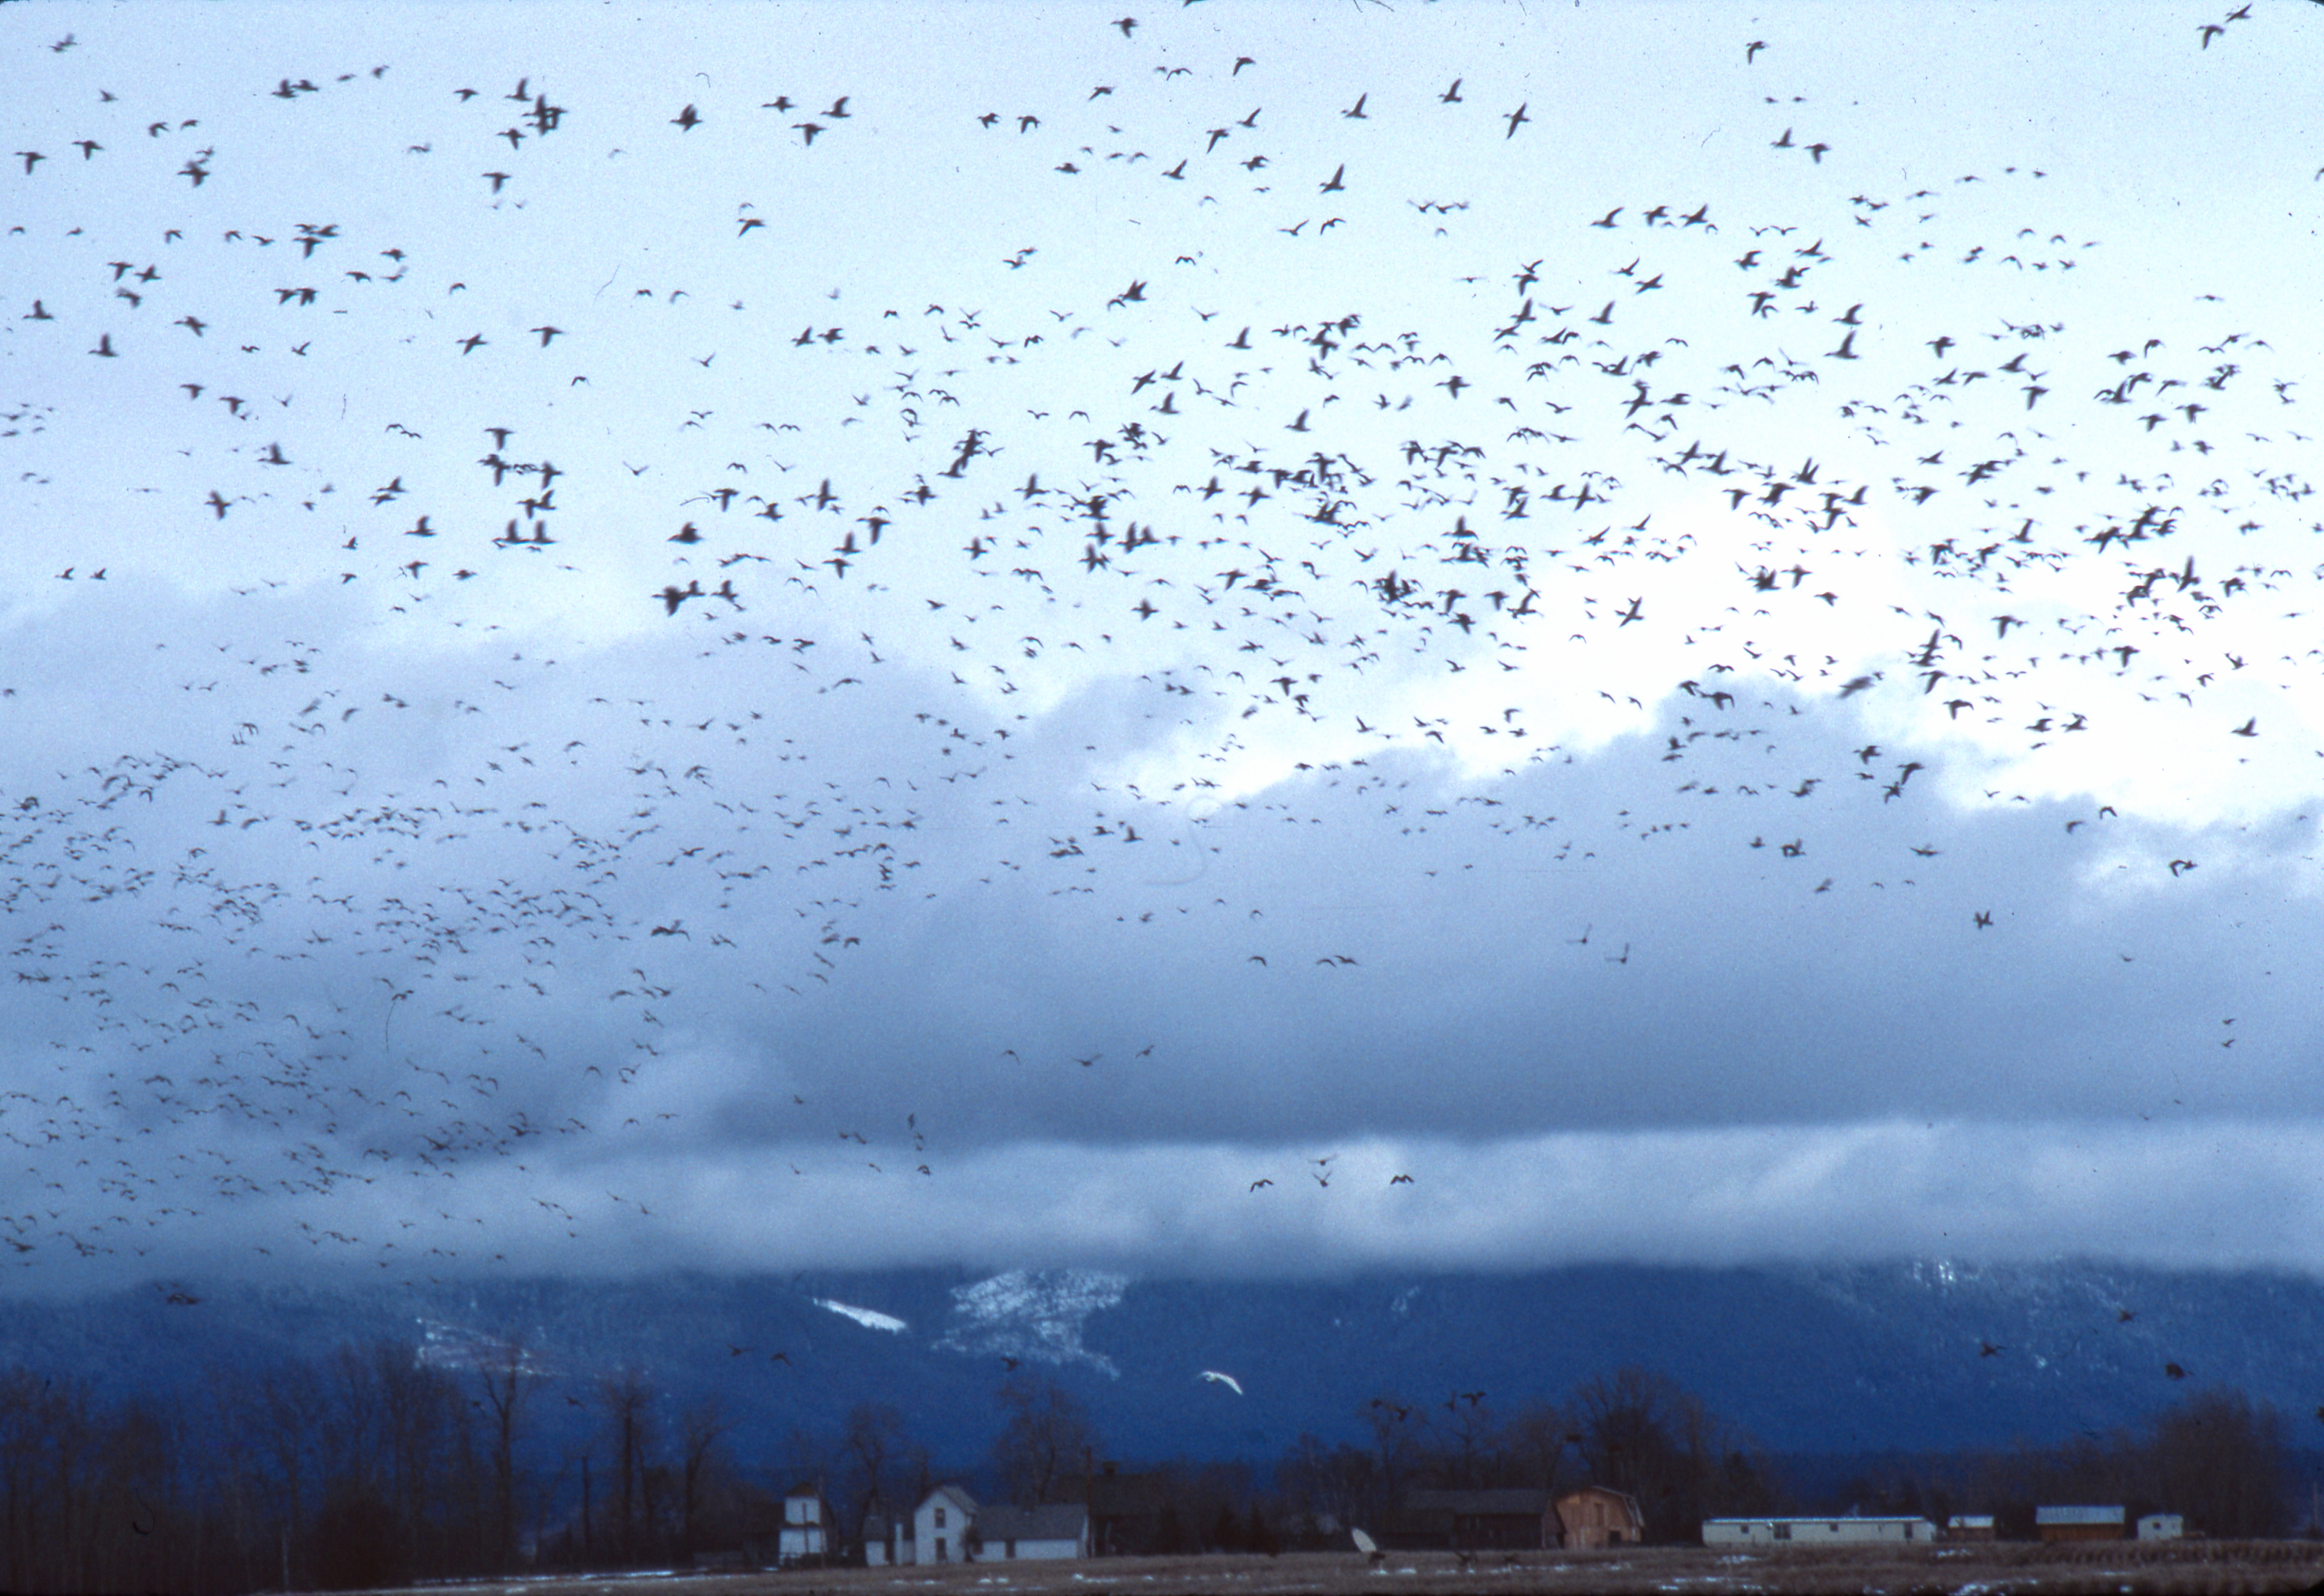 Birds_Lower Valley by Dan Casey